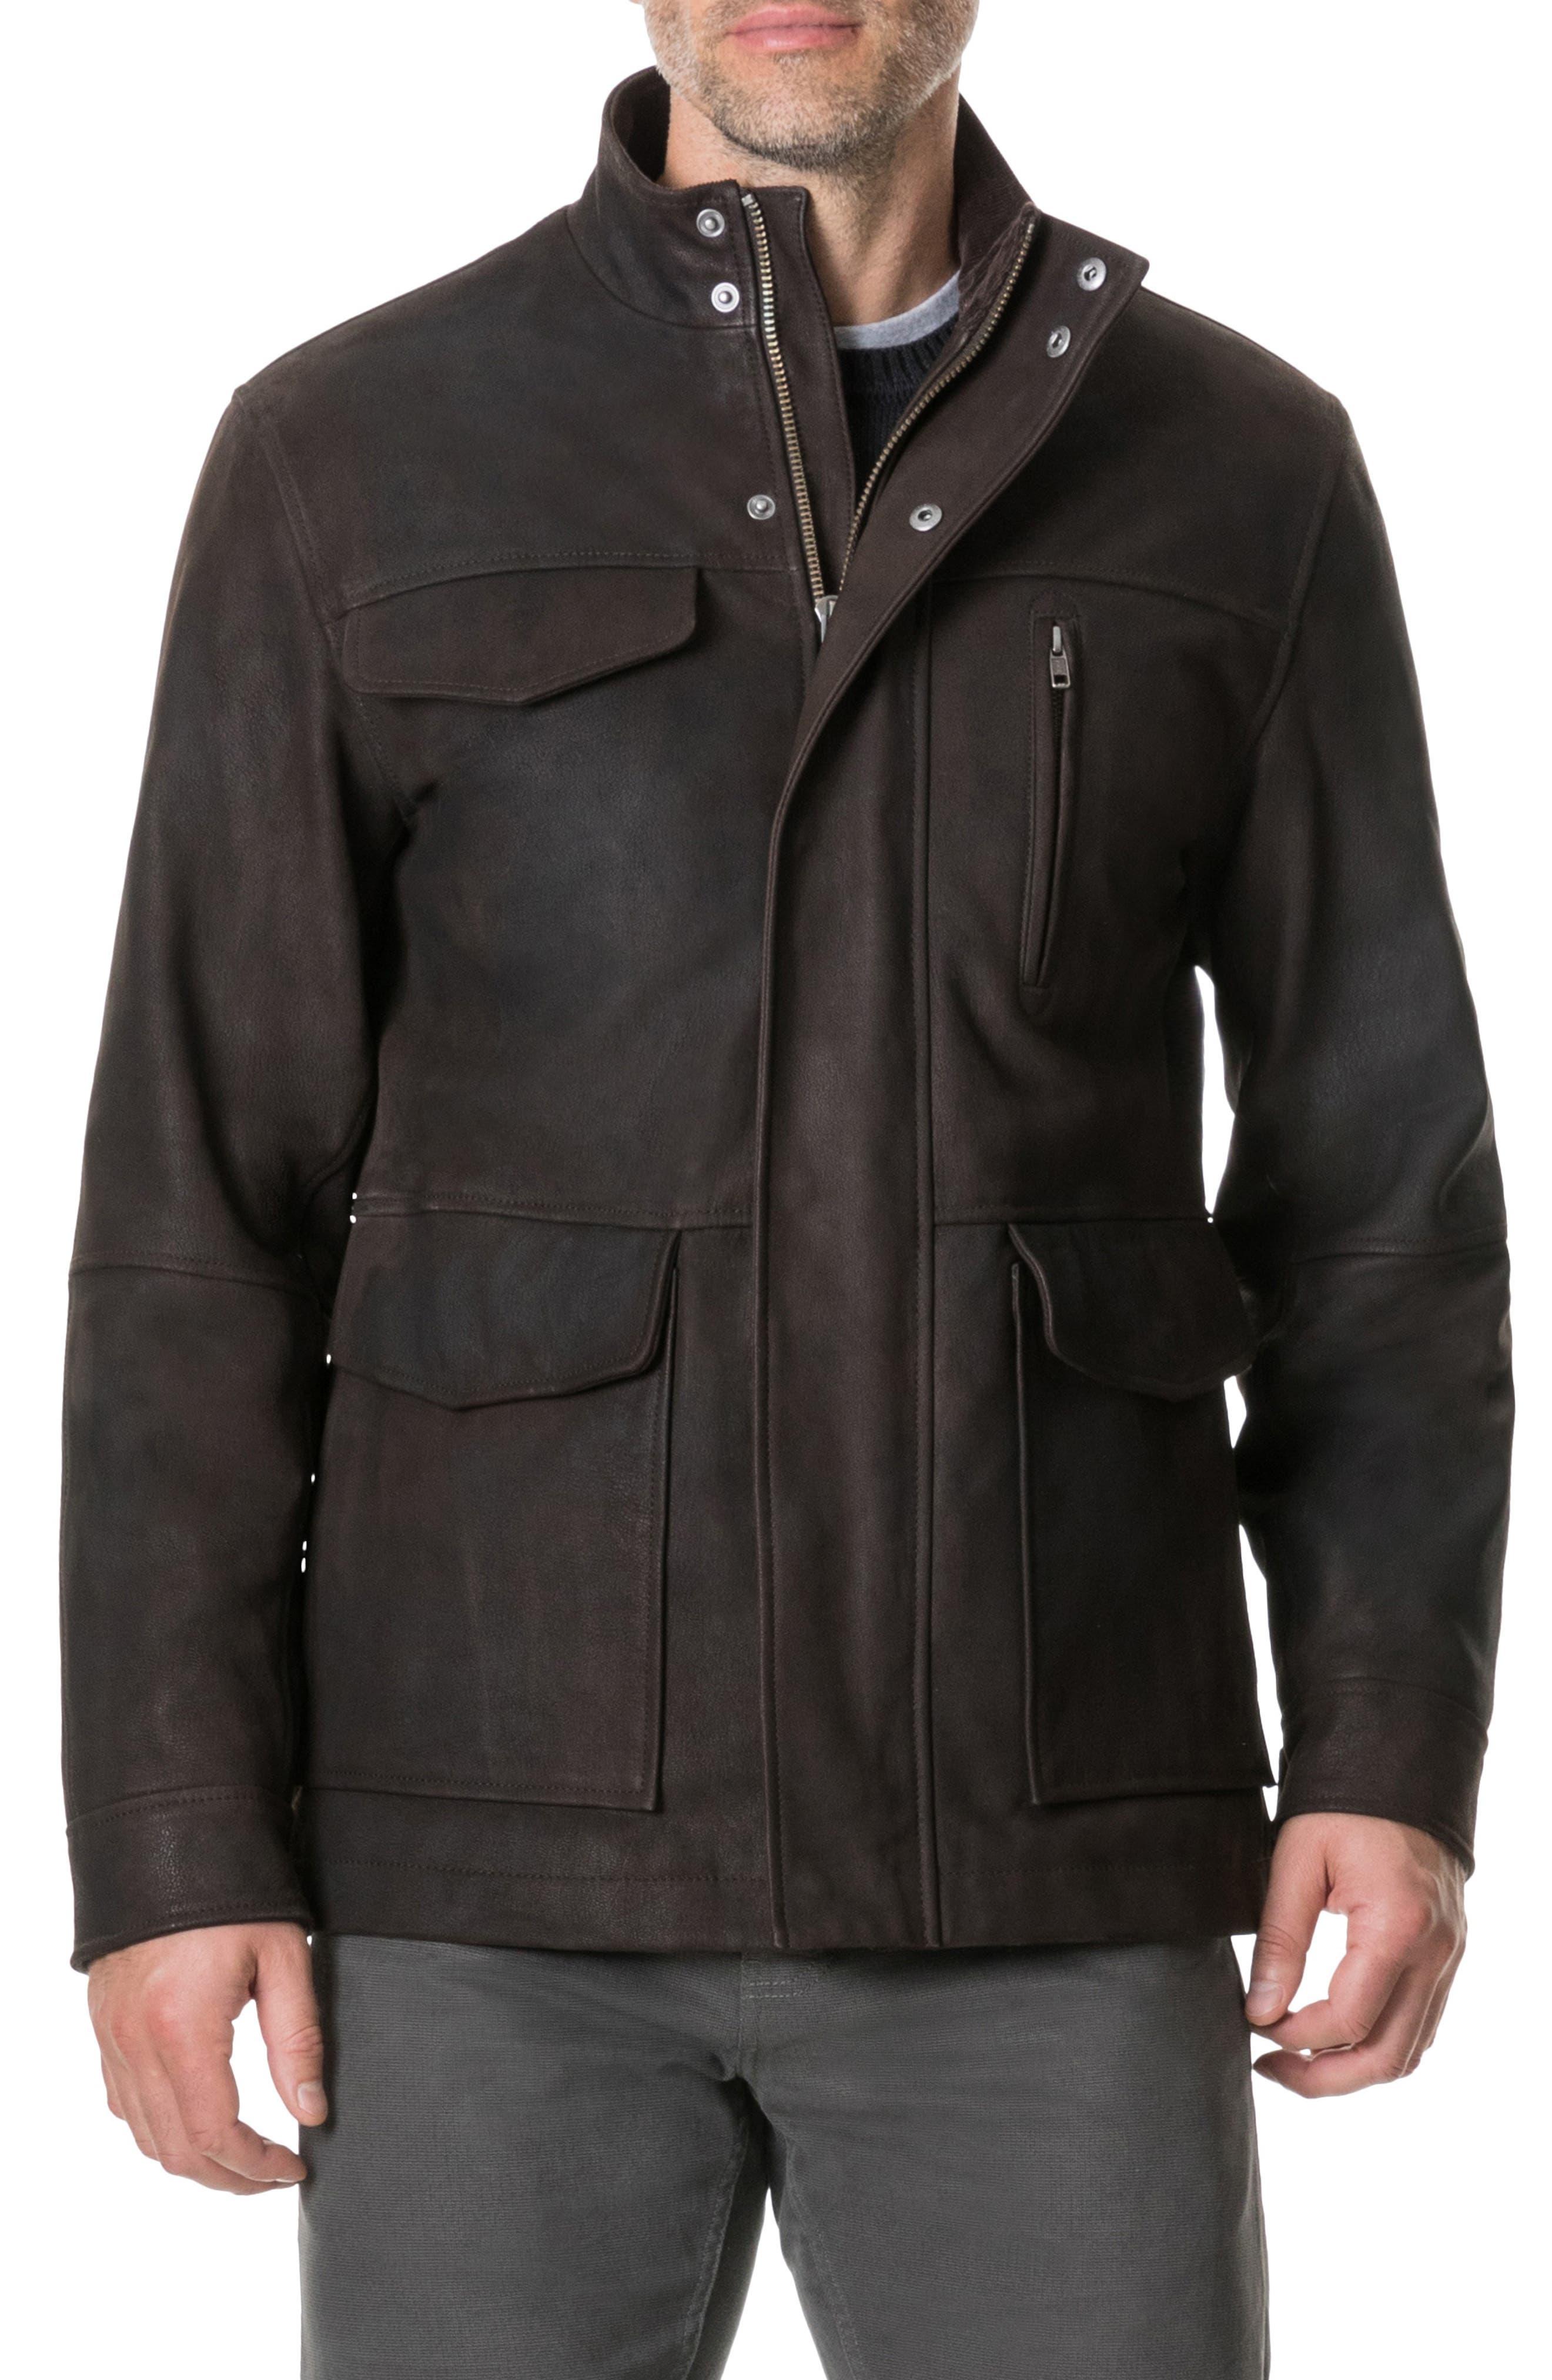 Fairholme Leather Jacket,                             Main thumbnail 1, color,                             CHOCOLATE